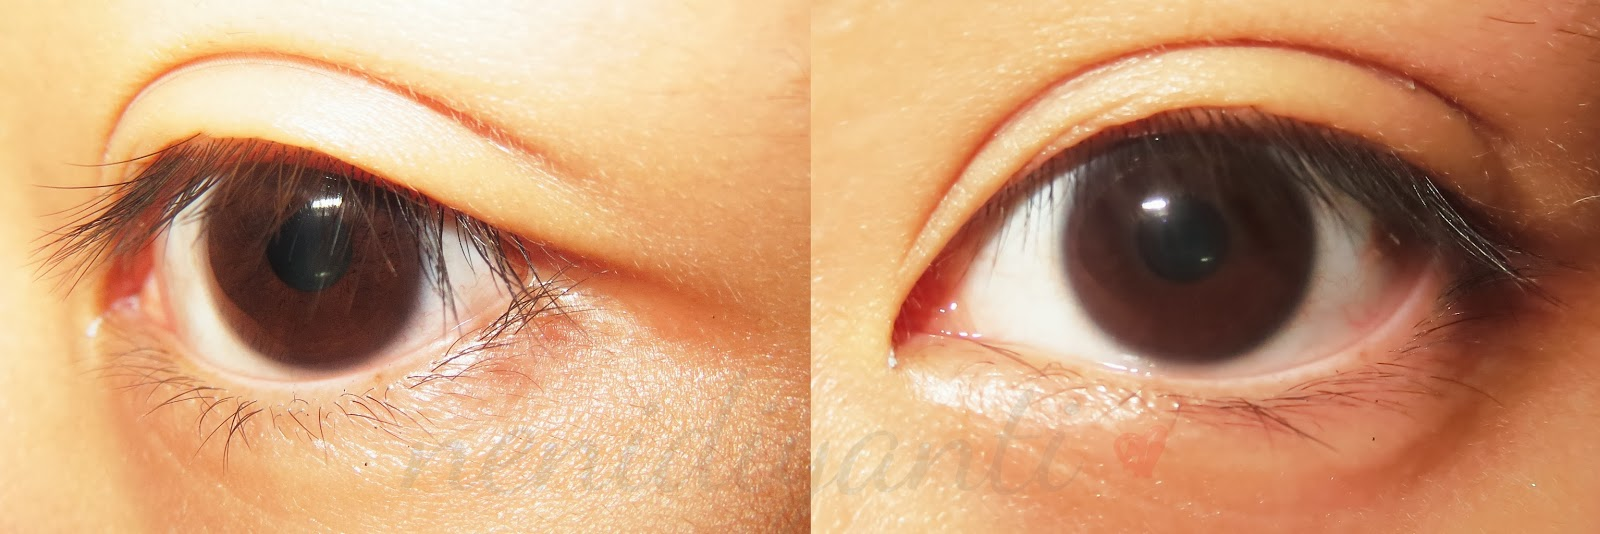 shu uemura eyelash curler before after. before. after shu uemura eyelash curler before after